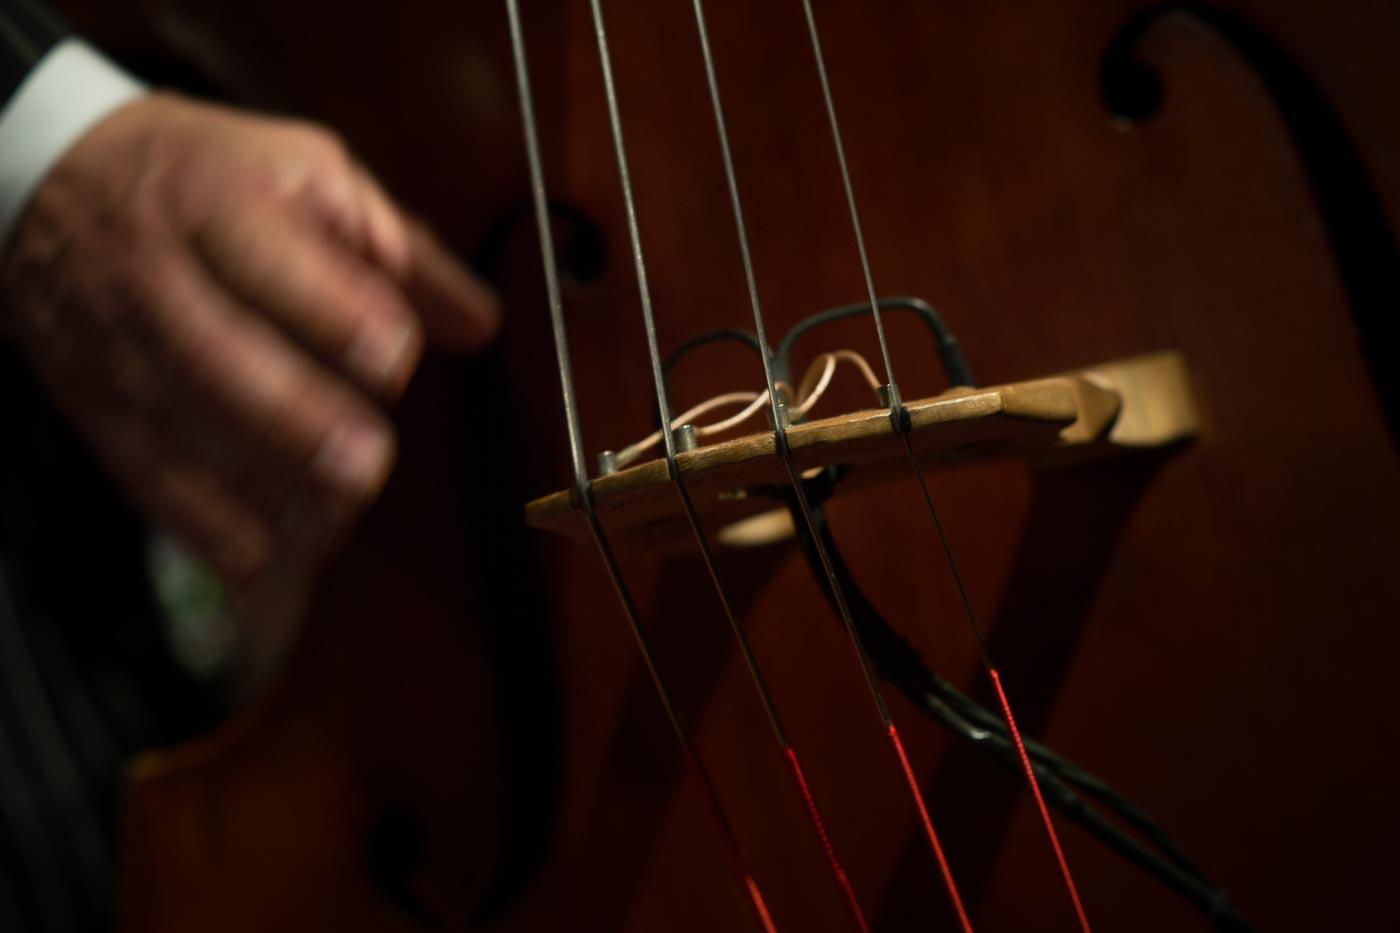 Hand zupft Saiten am Kontrabass, Detailansicht Kontrabass-Steg mit Tonabnehmer